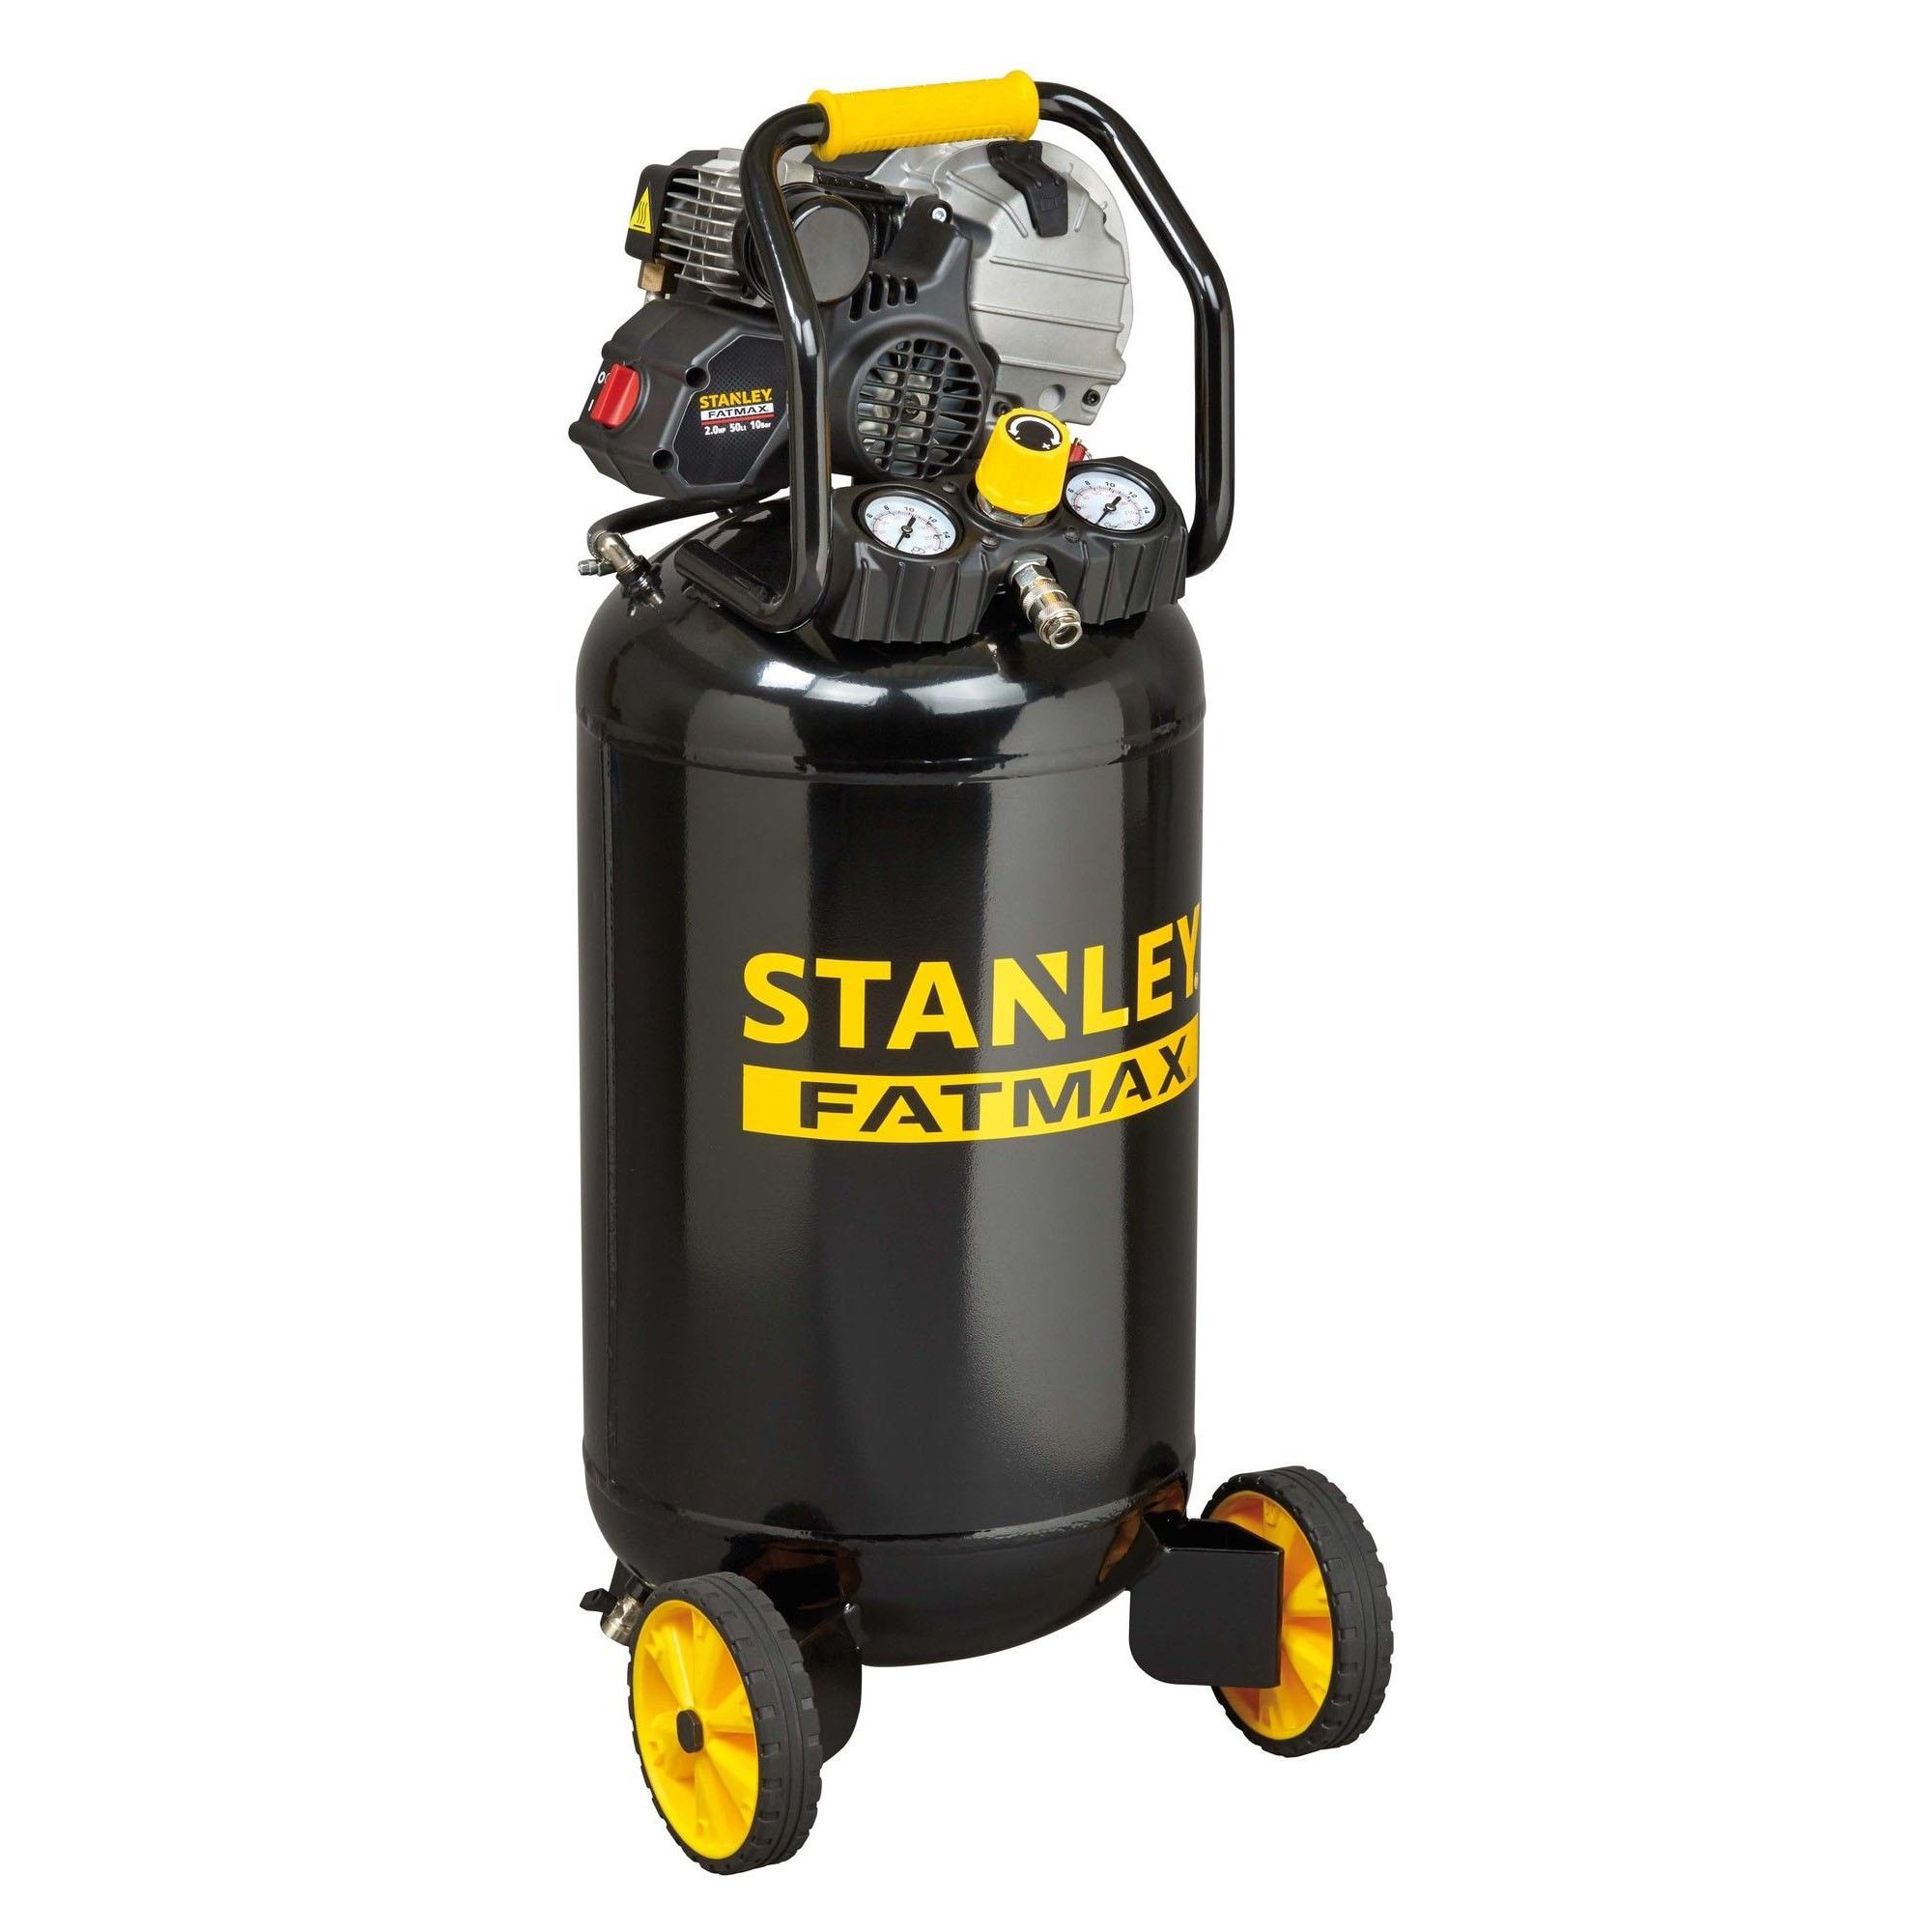 Fotografie Compresor de aer profesional Stanley FatMax, 50l, 2CP, 10 bar, 222l/m, vertical